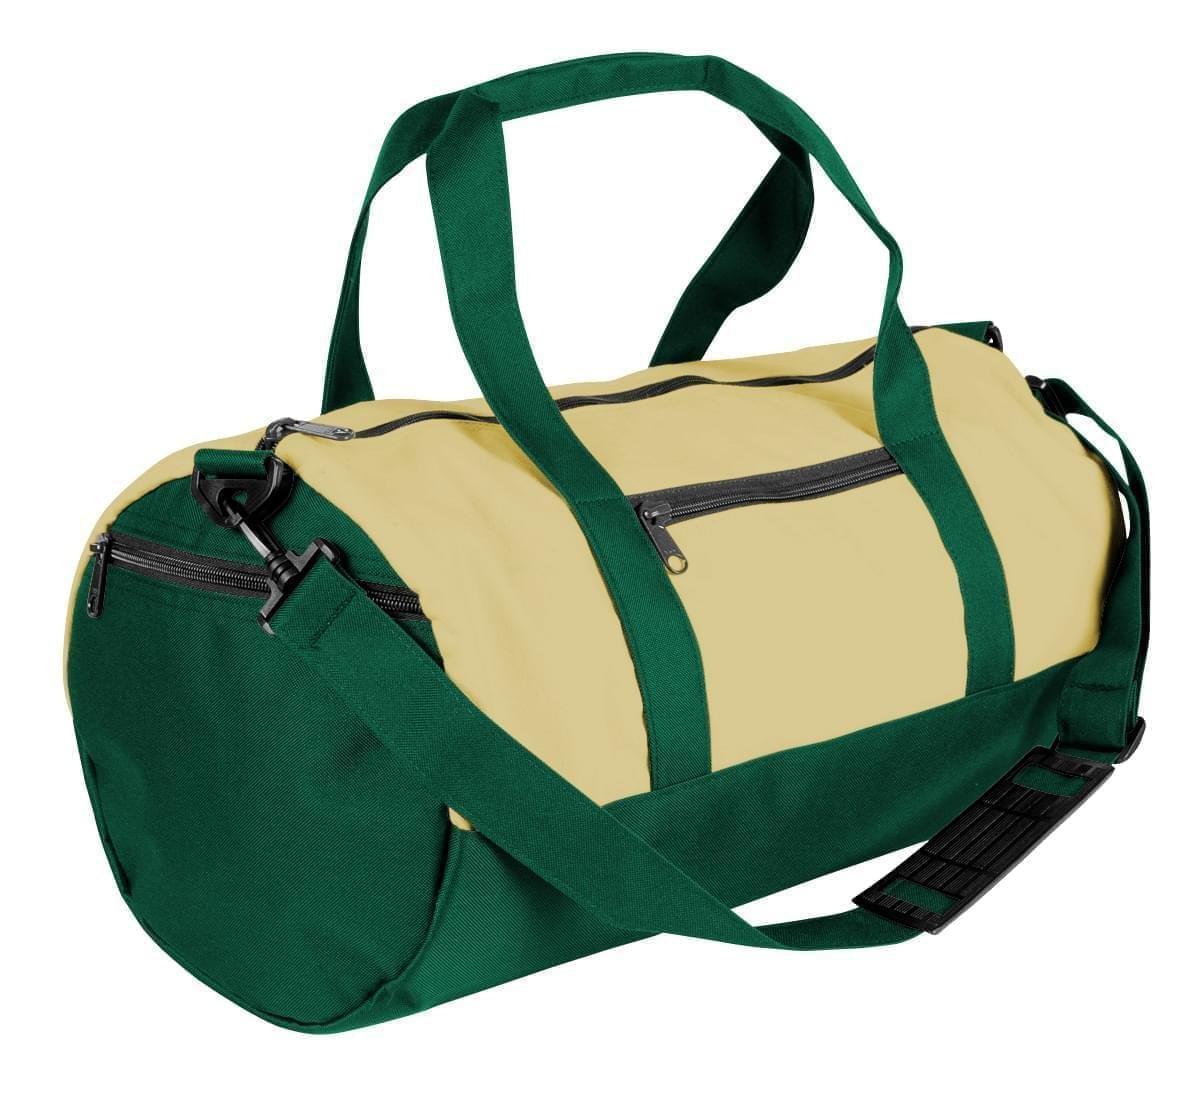 USA Made Canvas Equipment Duffle Bags, Natural-Hunter Green, PMLXZ2AAKV